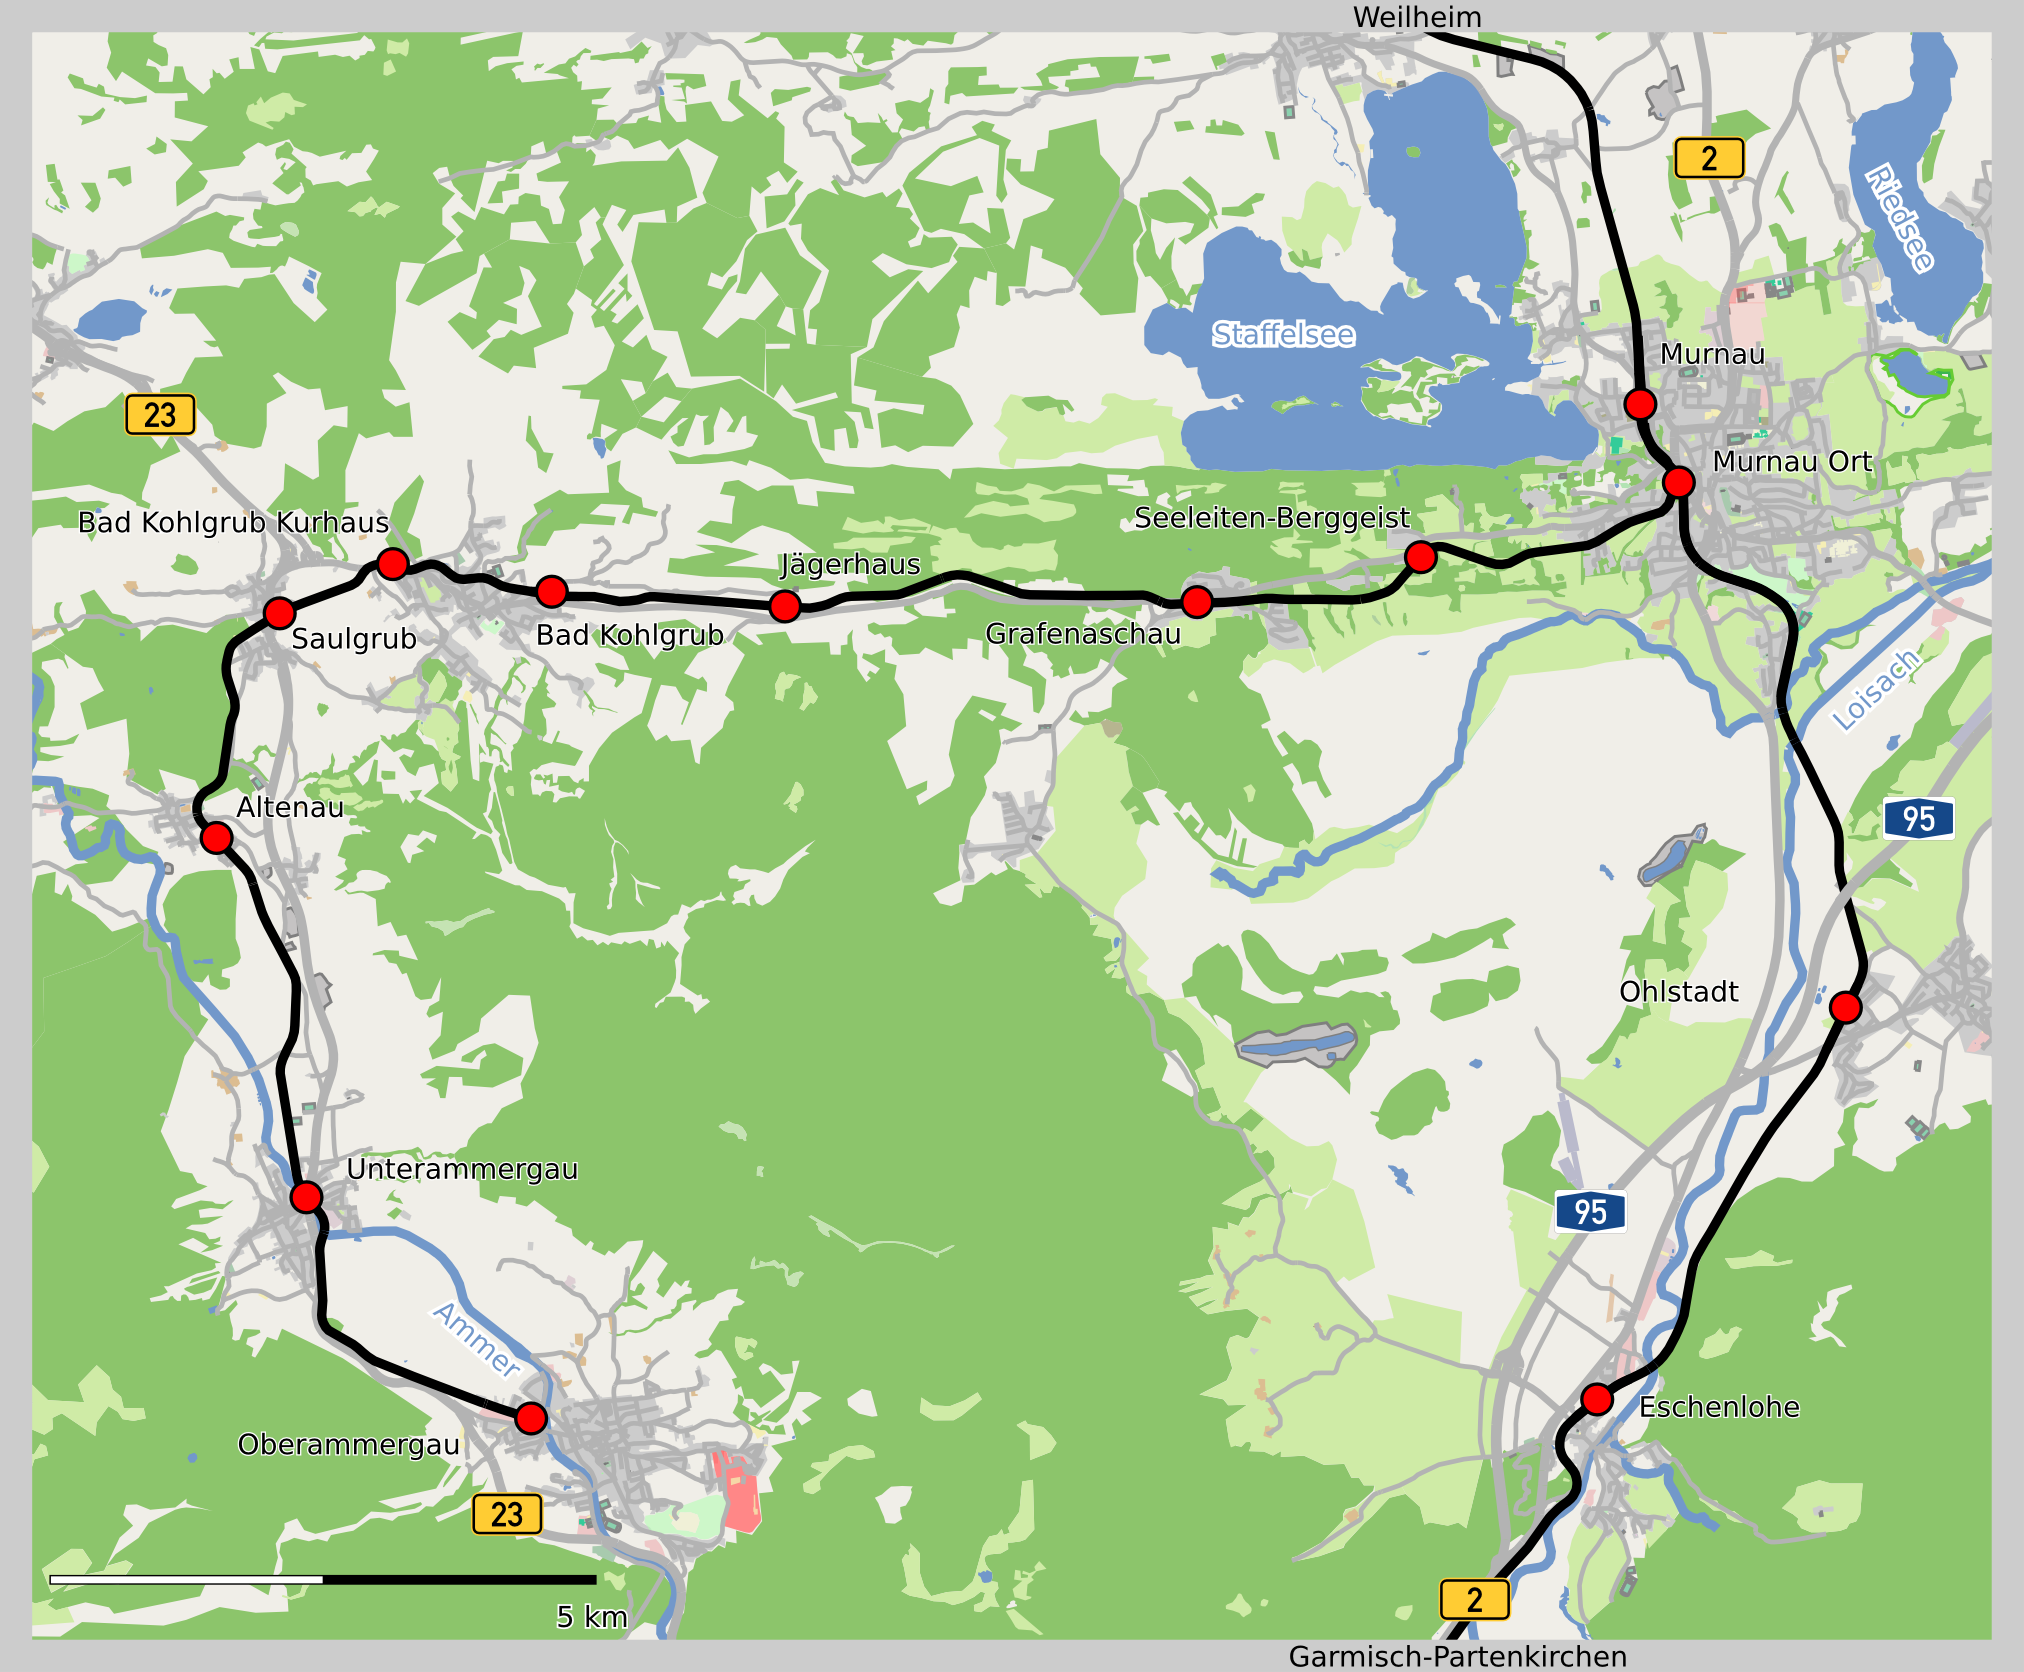 Murnau-Oberammergau-rata kartalla. Kuva: Vuxi OpenStreetMaps-datan pohjalta / Wikimedia Commons CC-BY-SA 2.0